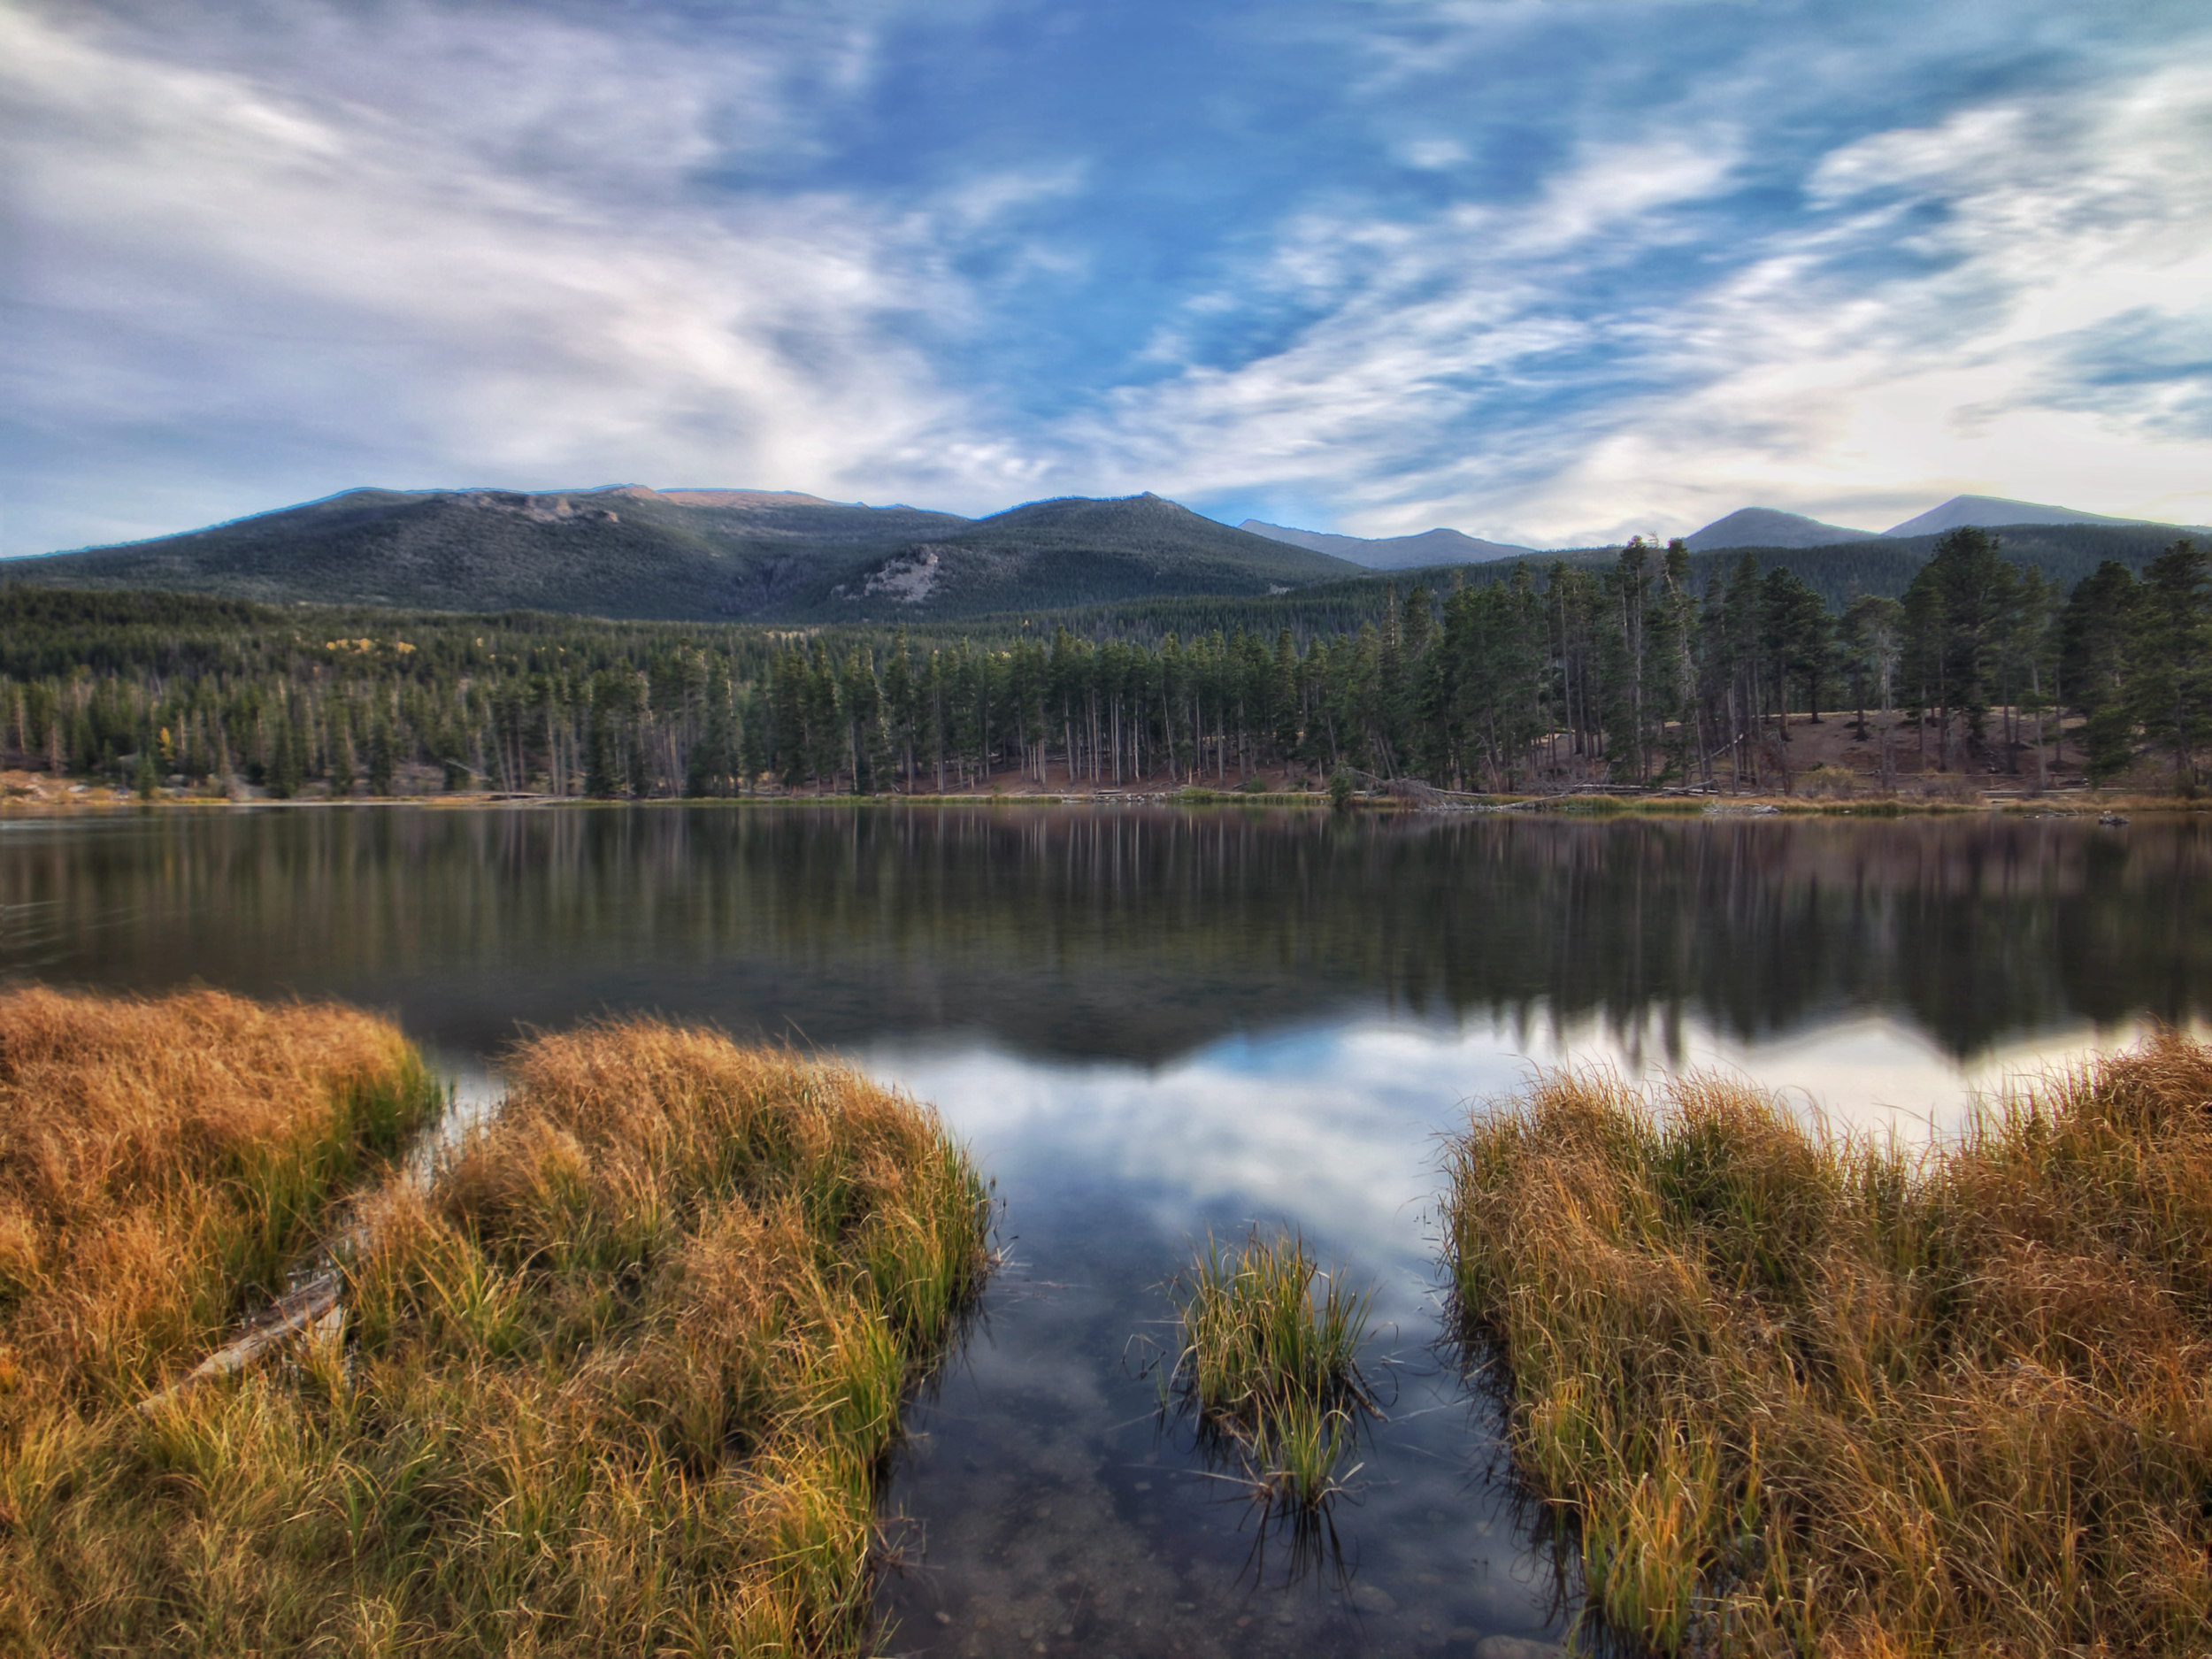 Prague lake @ Rocky Mountain national park